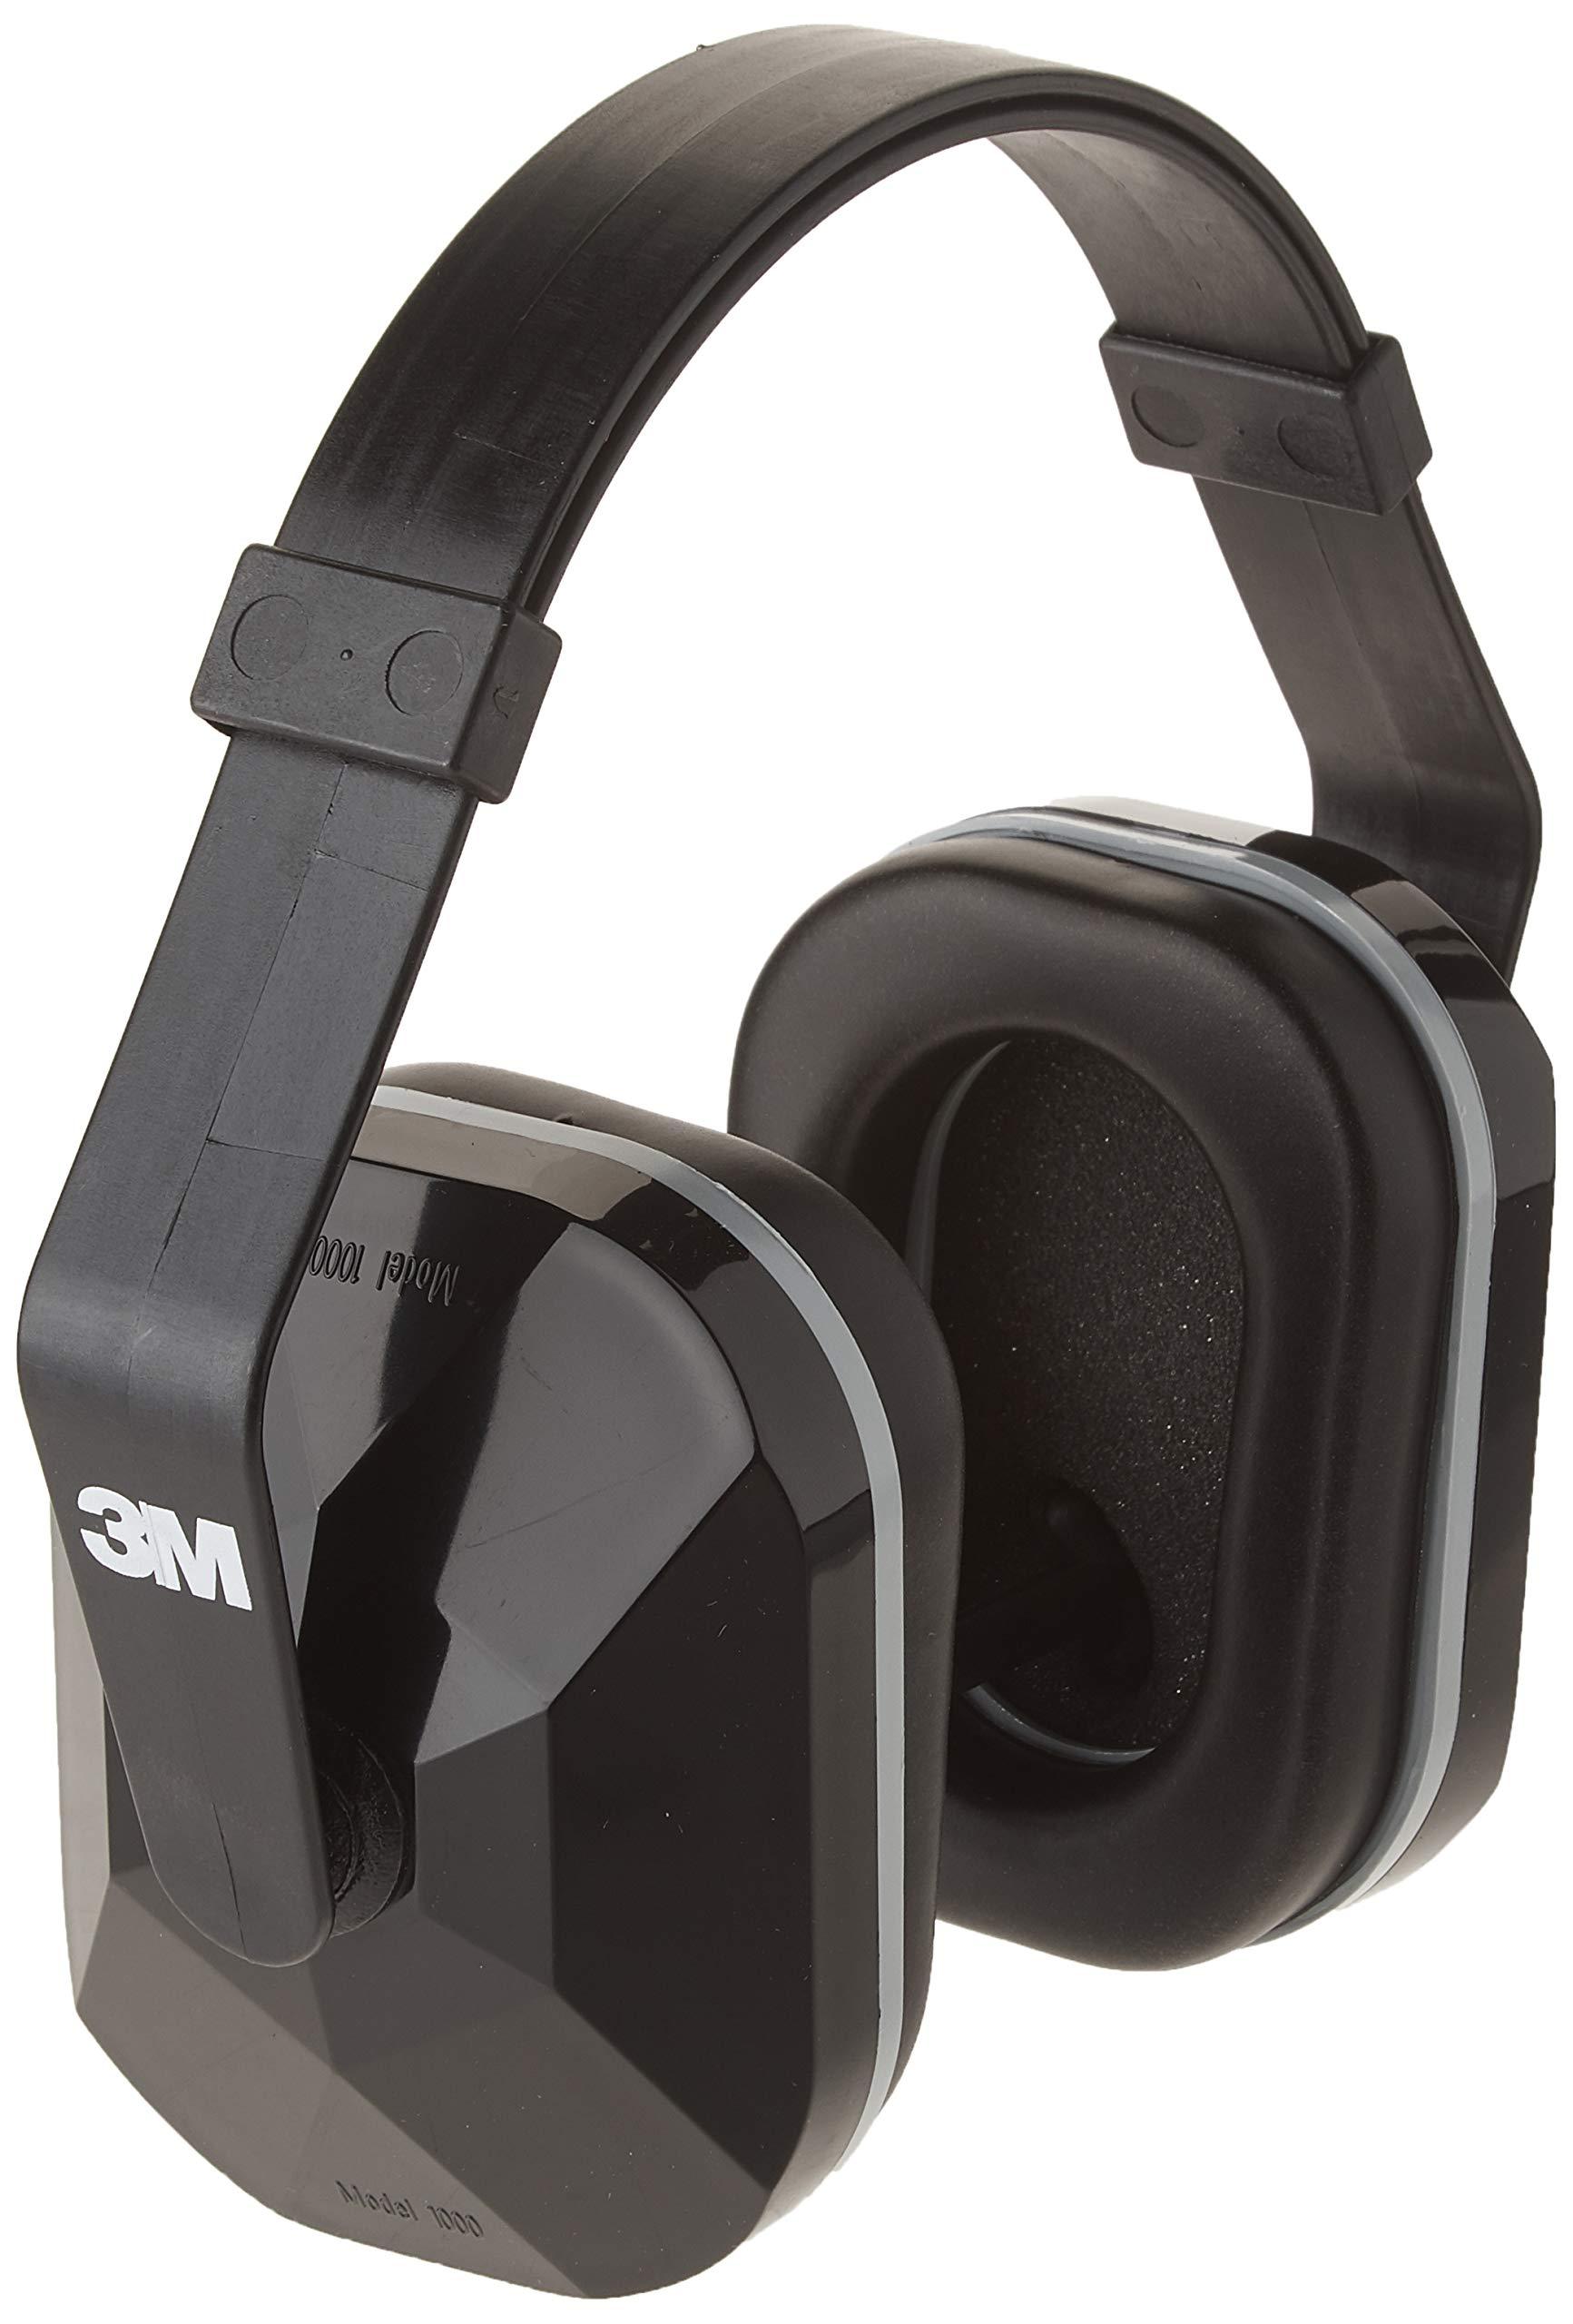 3M TEKK Protection Basic Earmuff